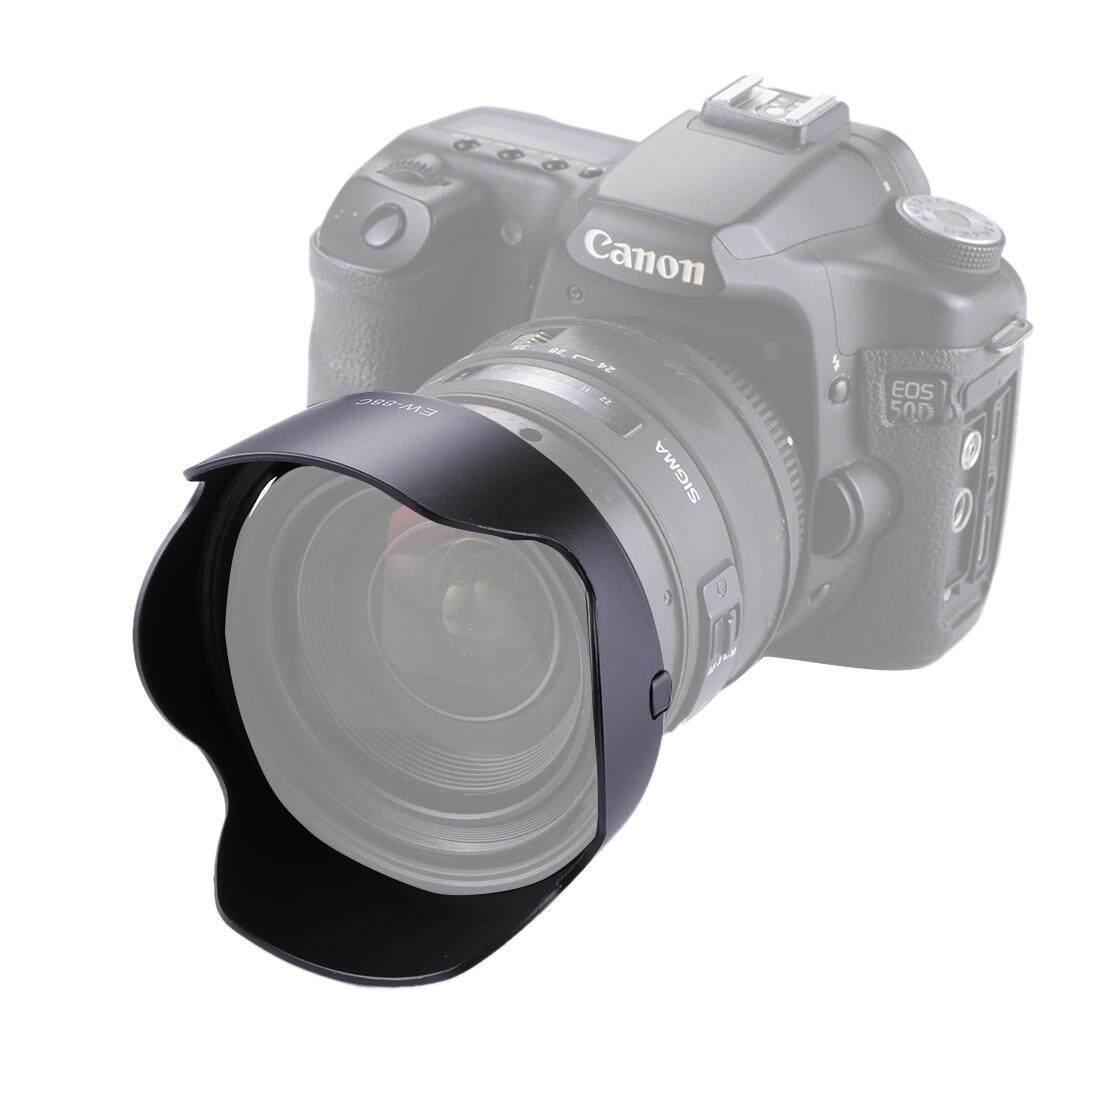 Buy Oem Lens Hoods And Covers Online Lazada Olympus Mzuiko Digital 75 300mm F48 67 Ii Black Ew 88c Hood Shade For Canon Camera Ef 24 70 28l